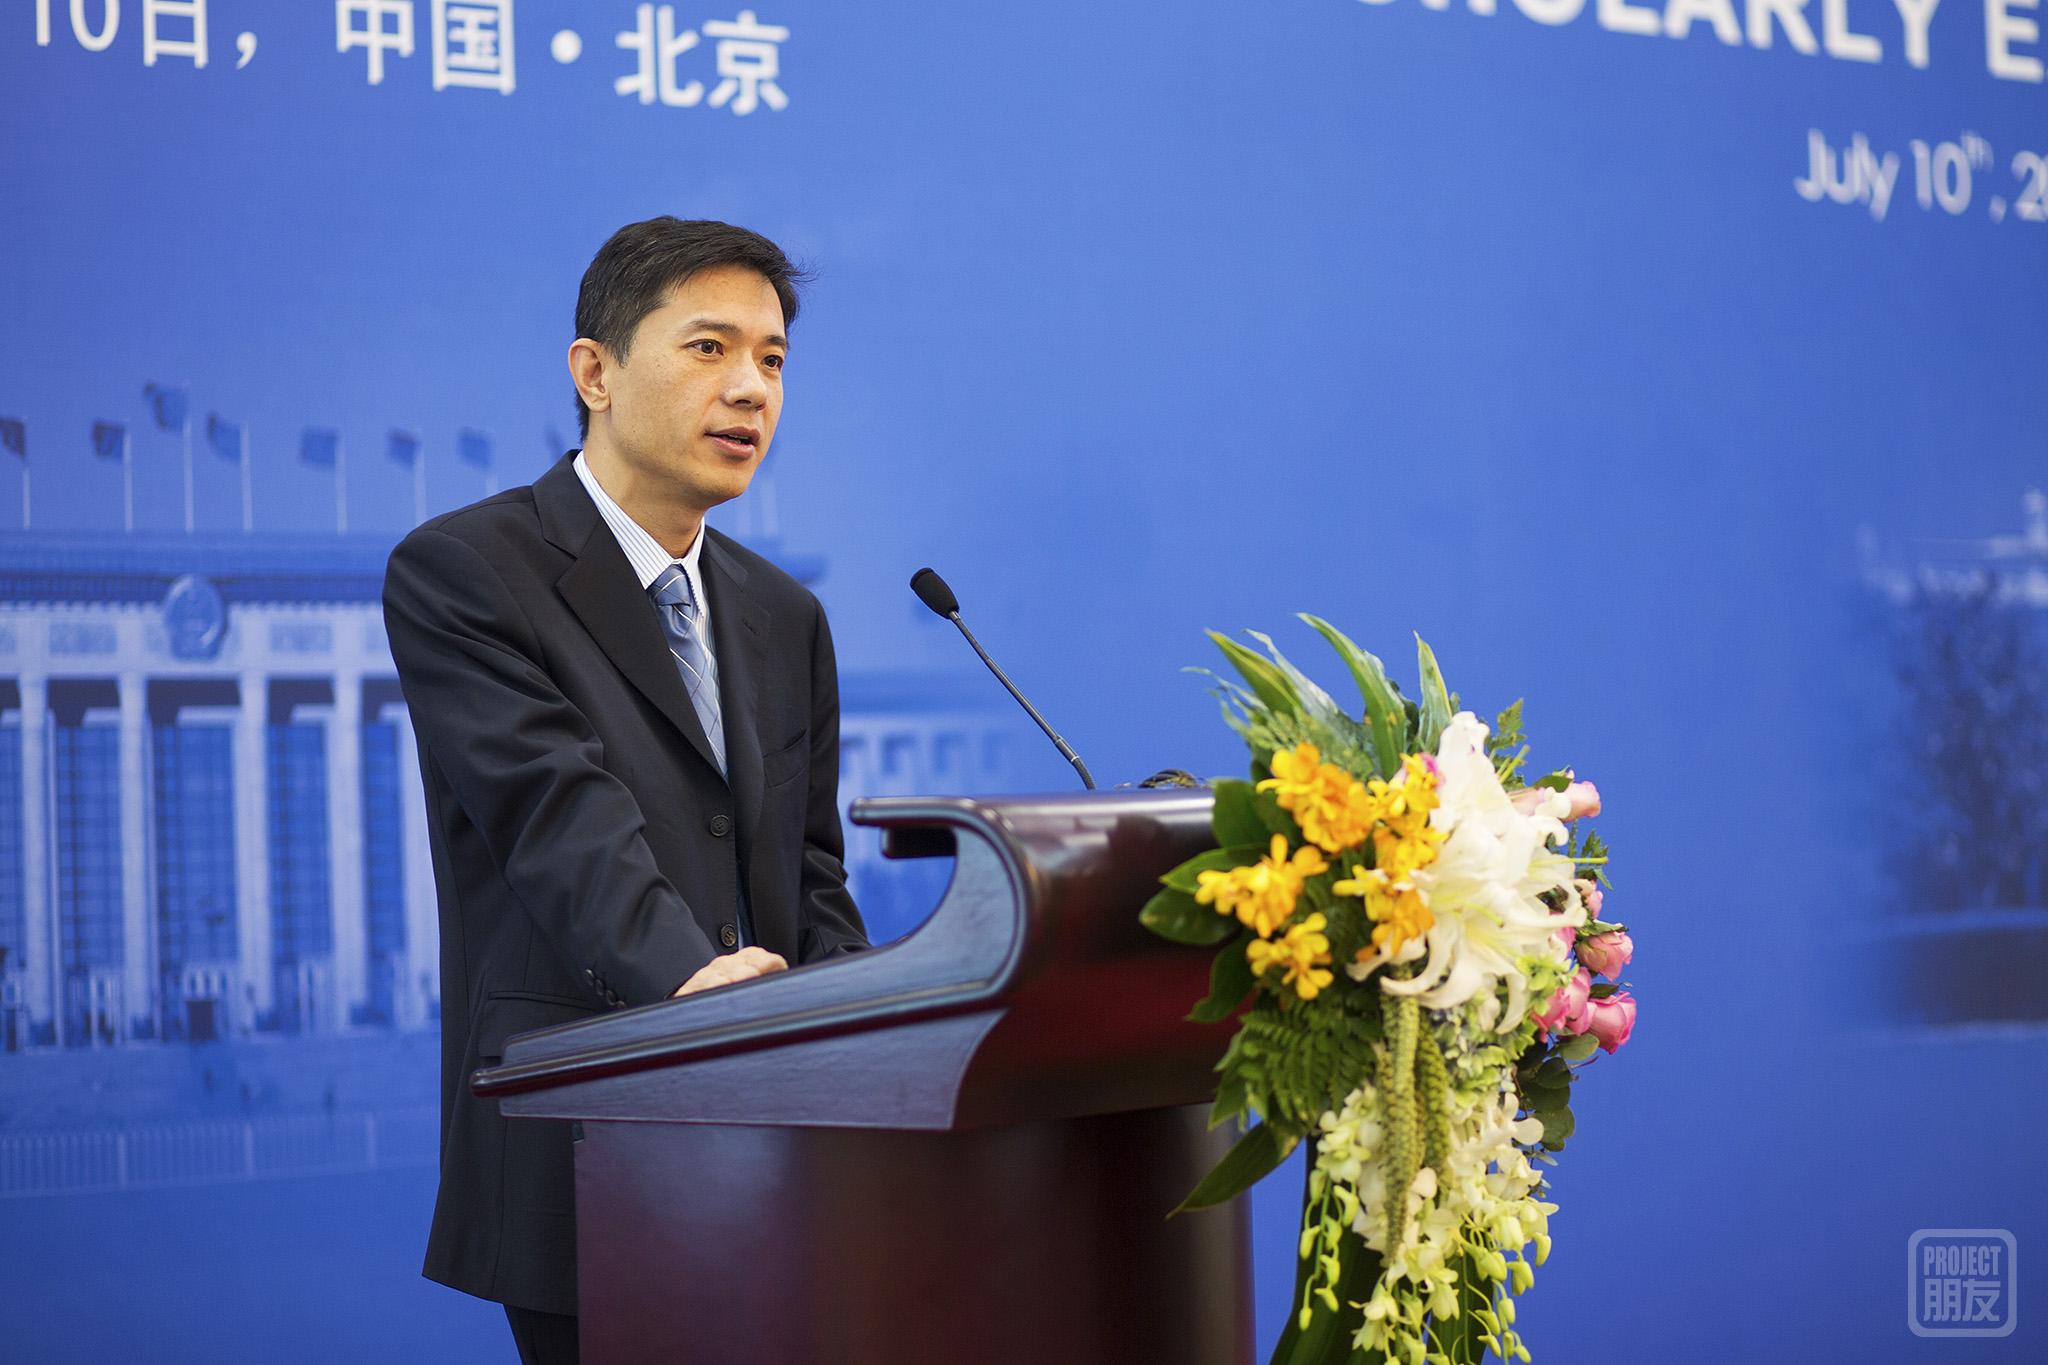 Robin Li, Founder and CEO of Baidu